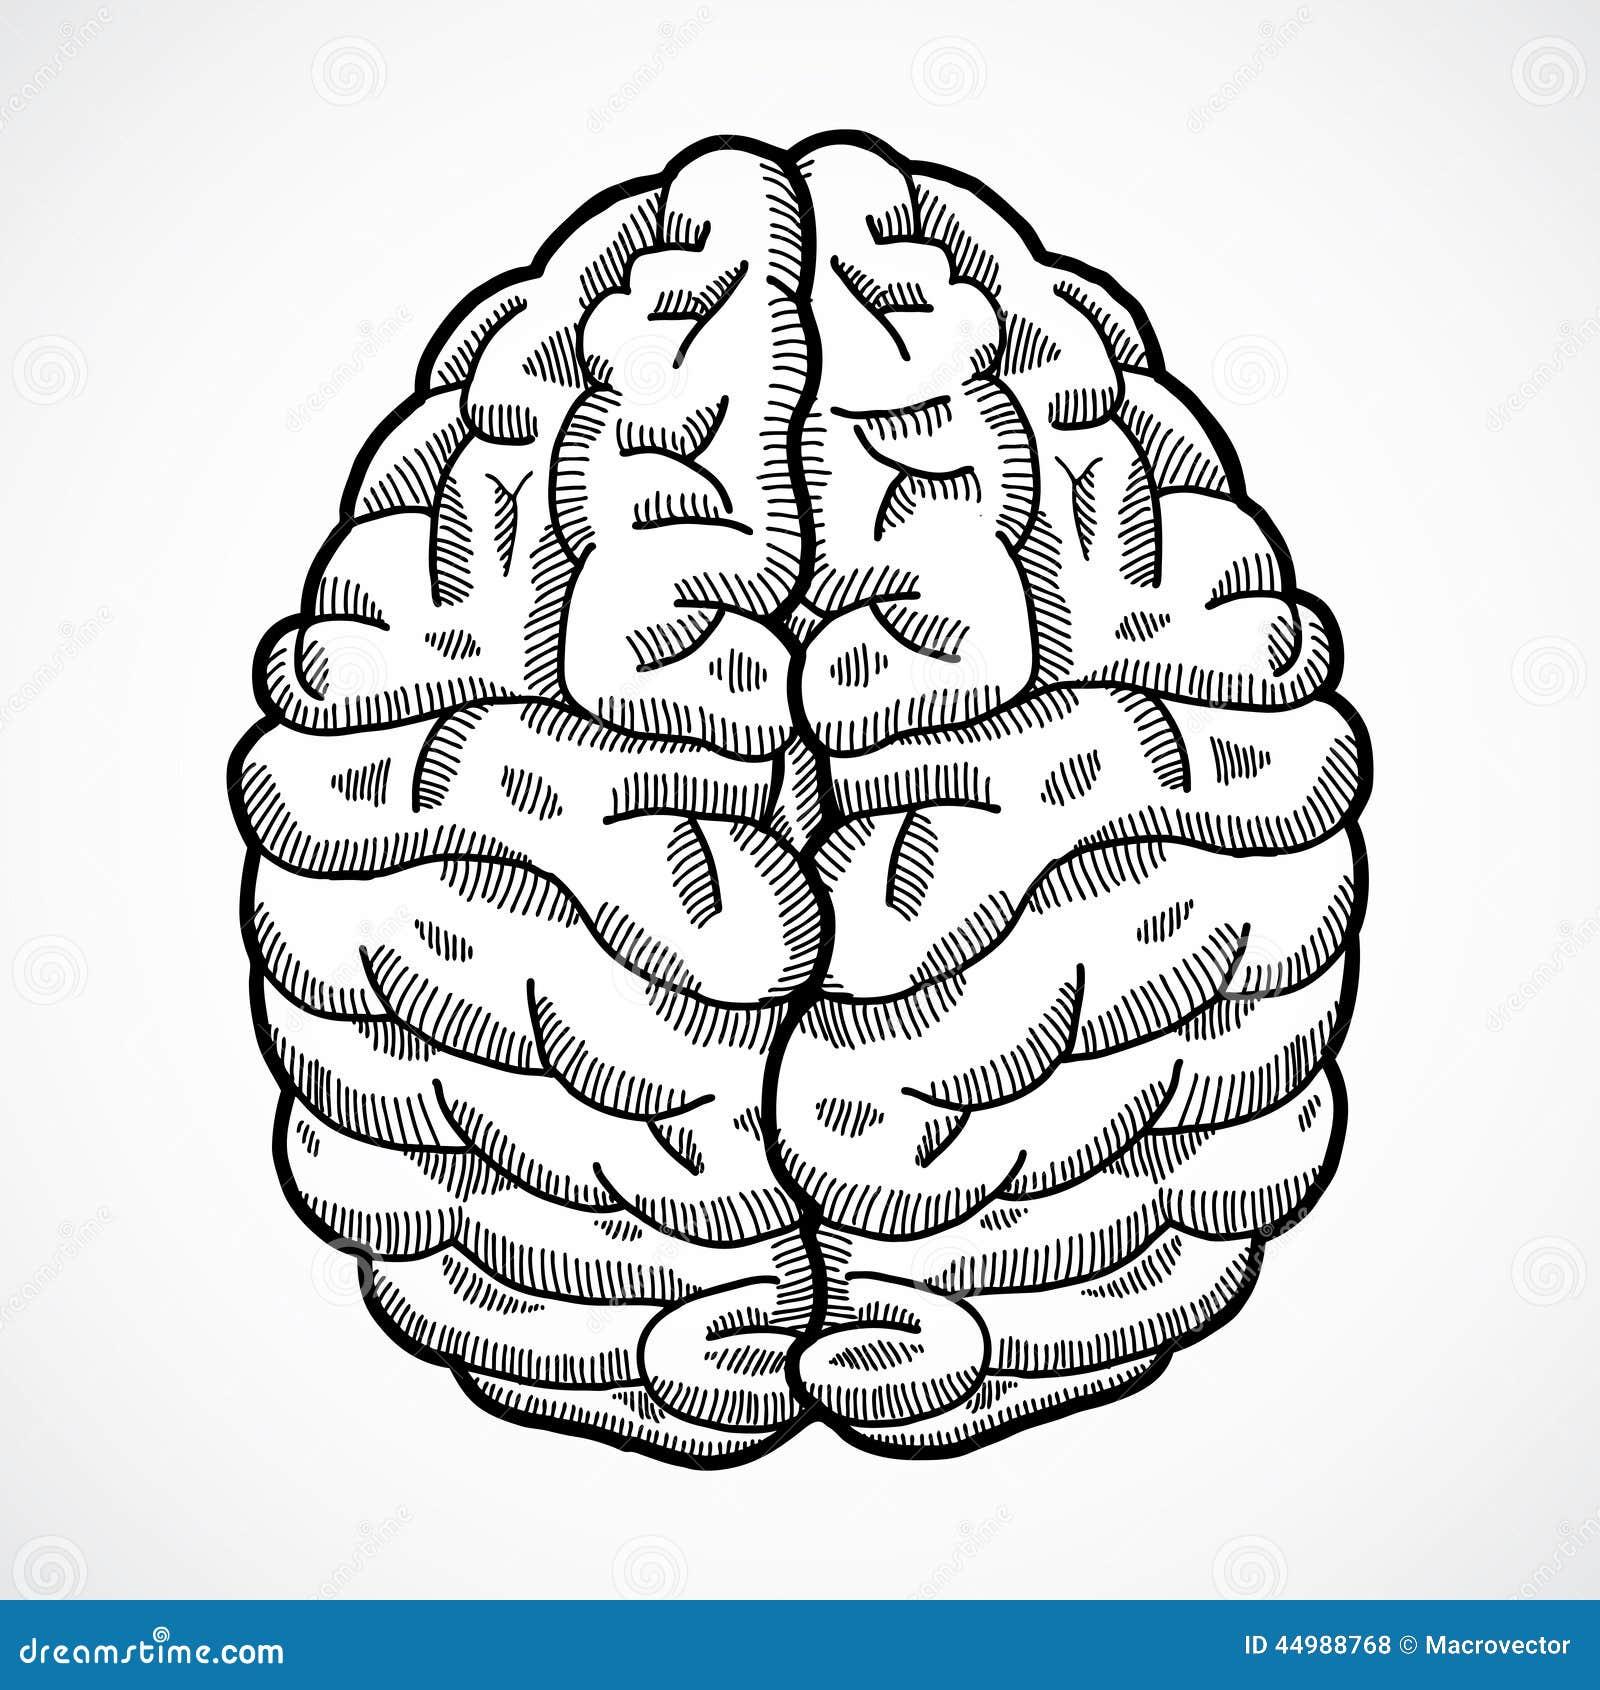 brain top view vector - photo #13